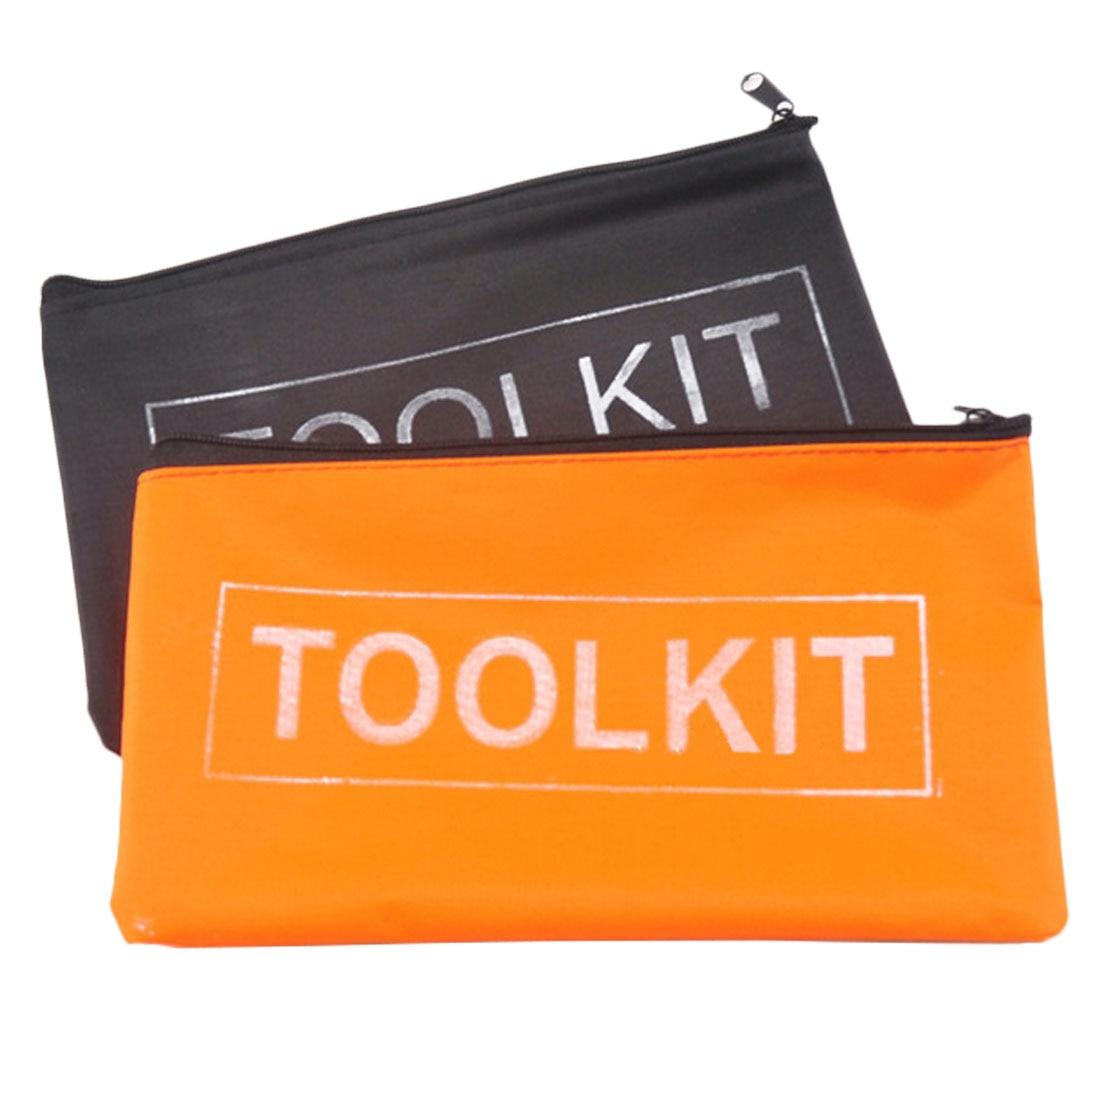 Oxford Cloth Tools Set Bag Zipper Storage Instrument Case Pouch Waterproof